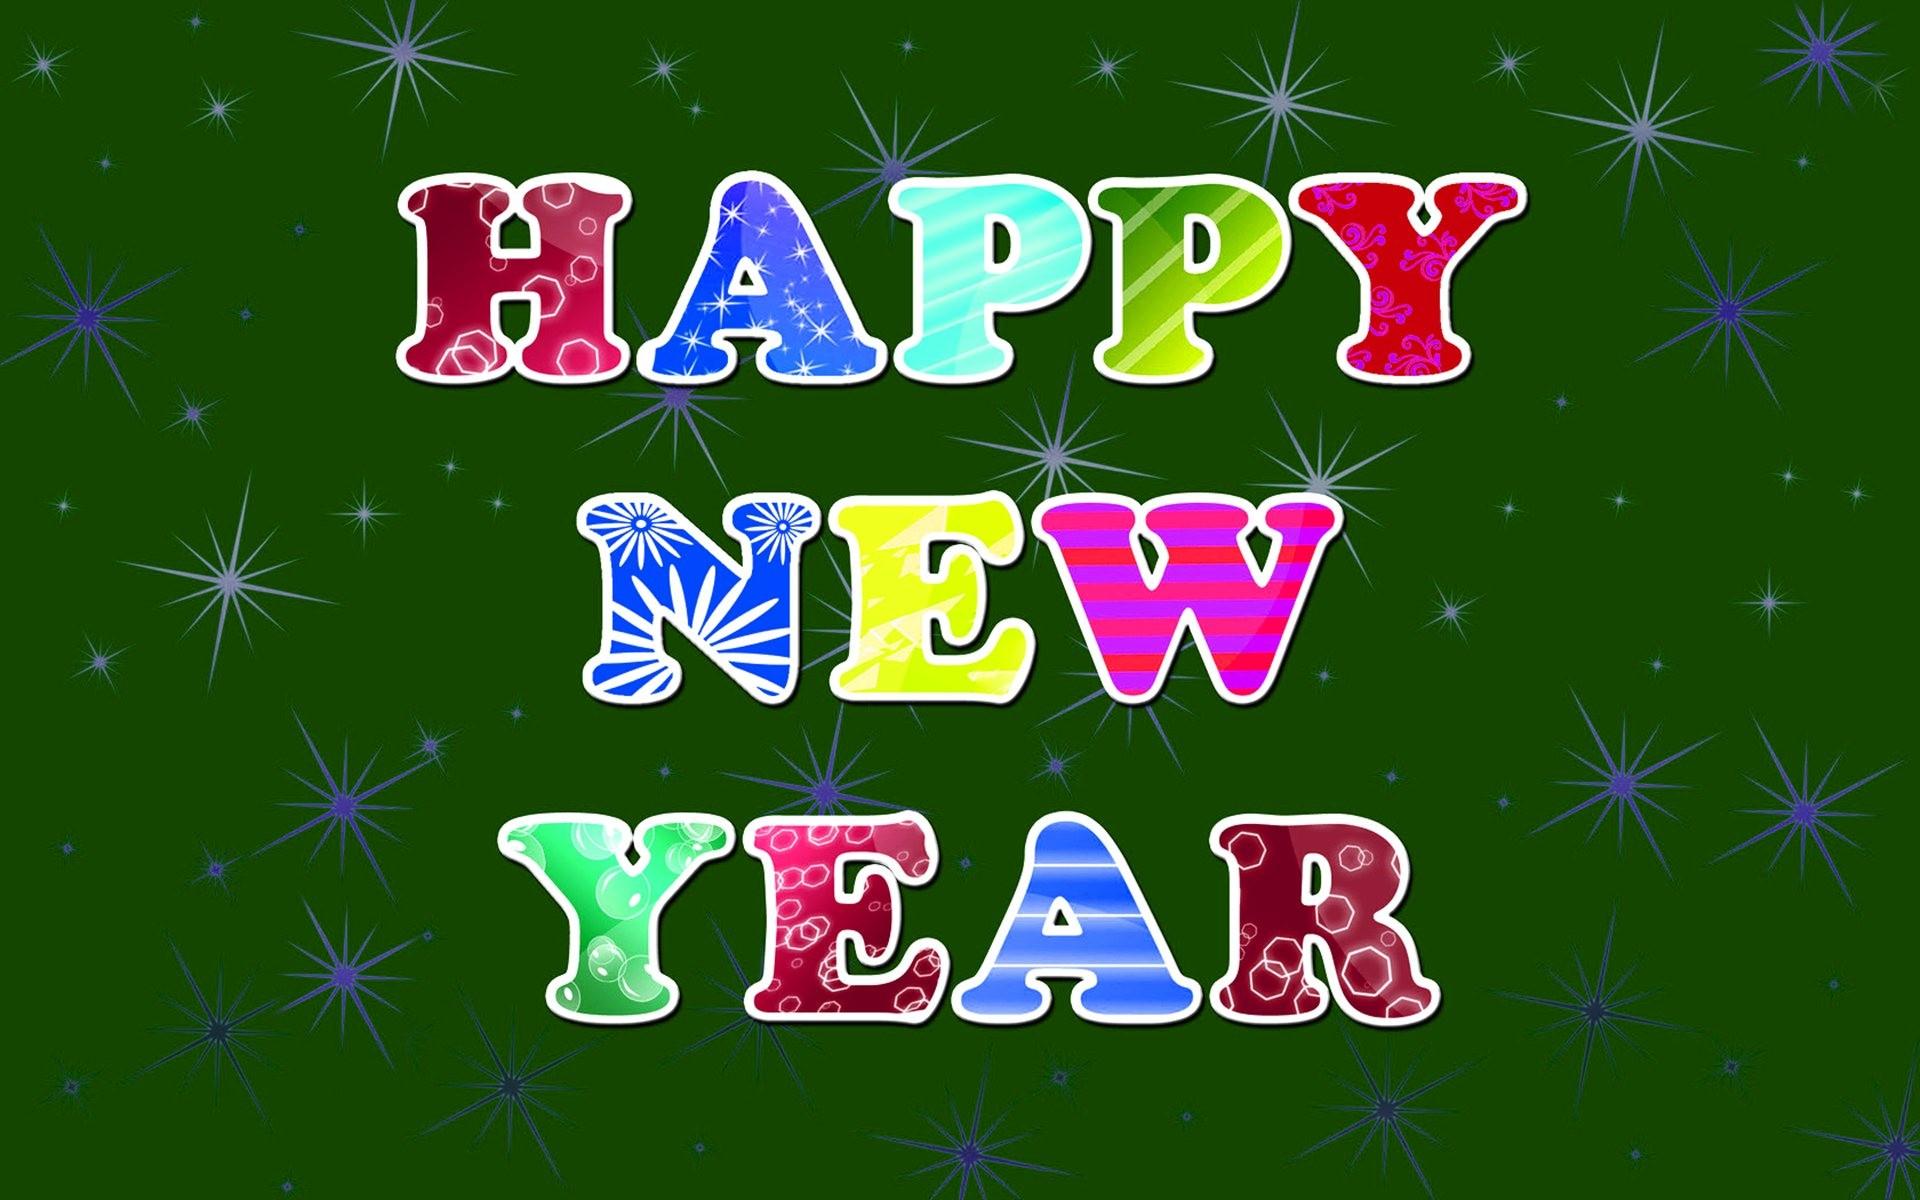 New Year Images 2017 – https://www.welcomehappynewyear2016.com/new-year-images-2017/  #HappyNewYear2016 #HappyNewYearImages2016 #HappyNewYear2016Phot…